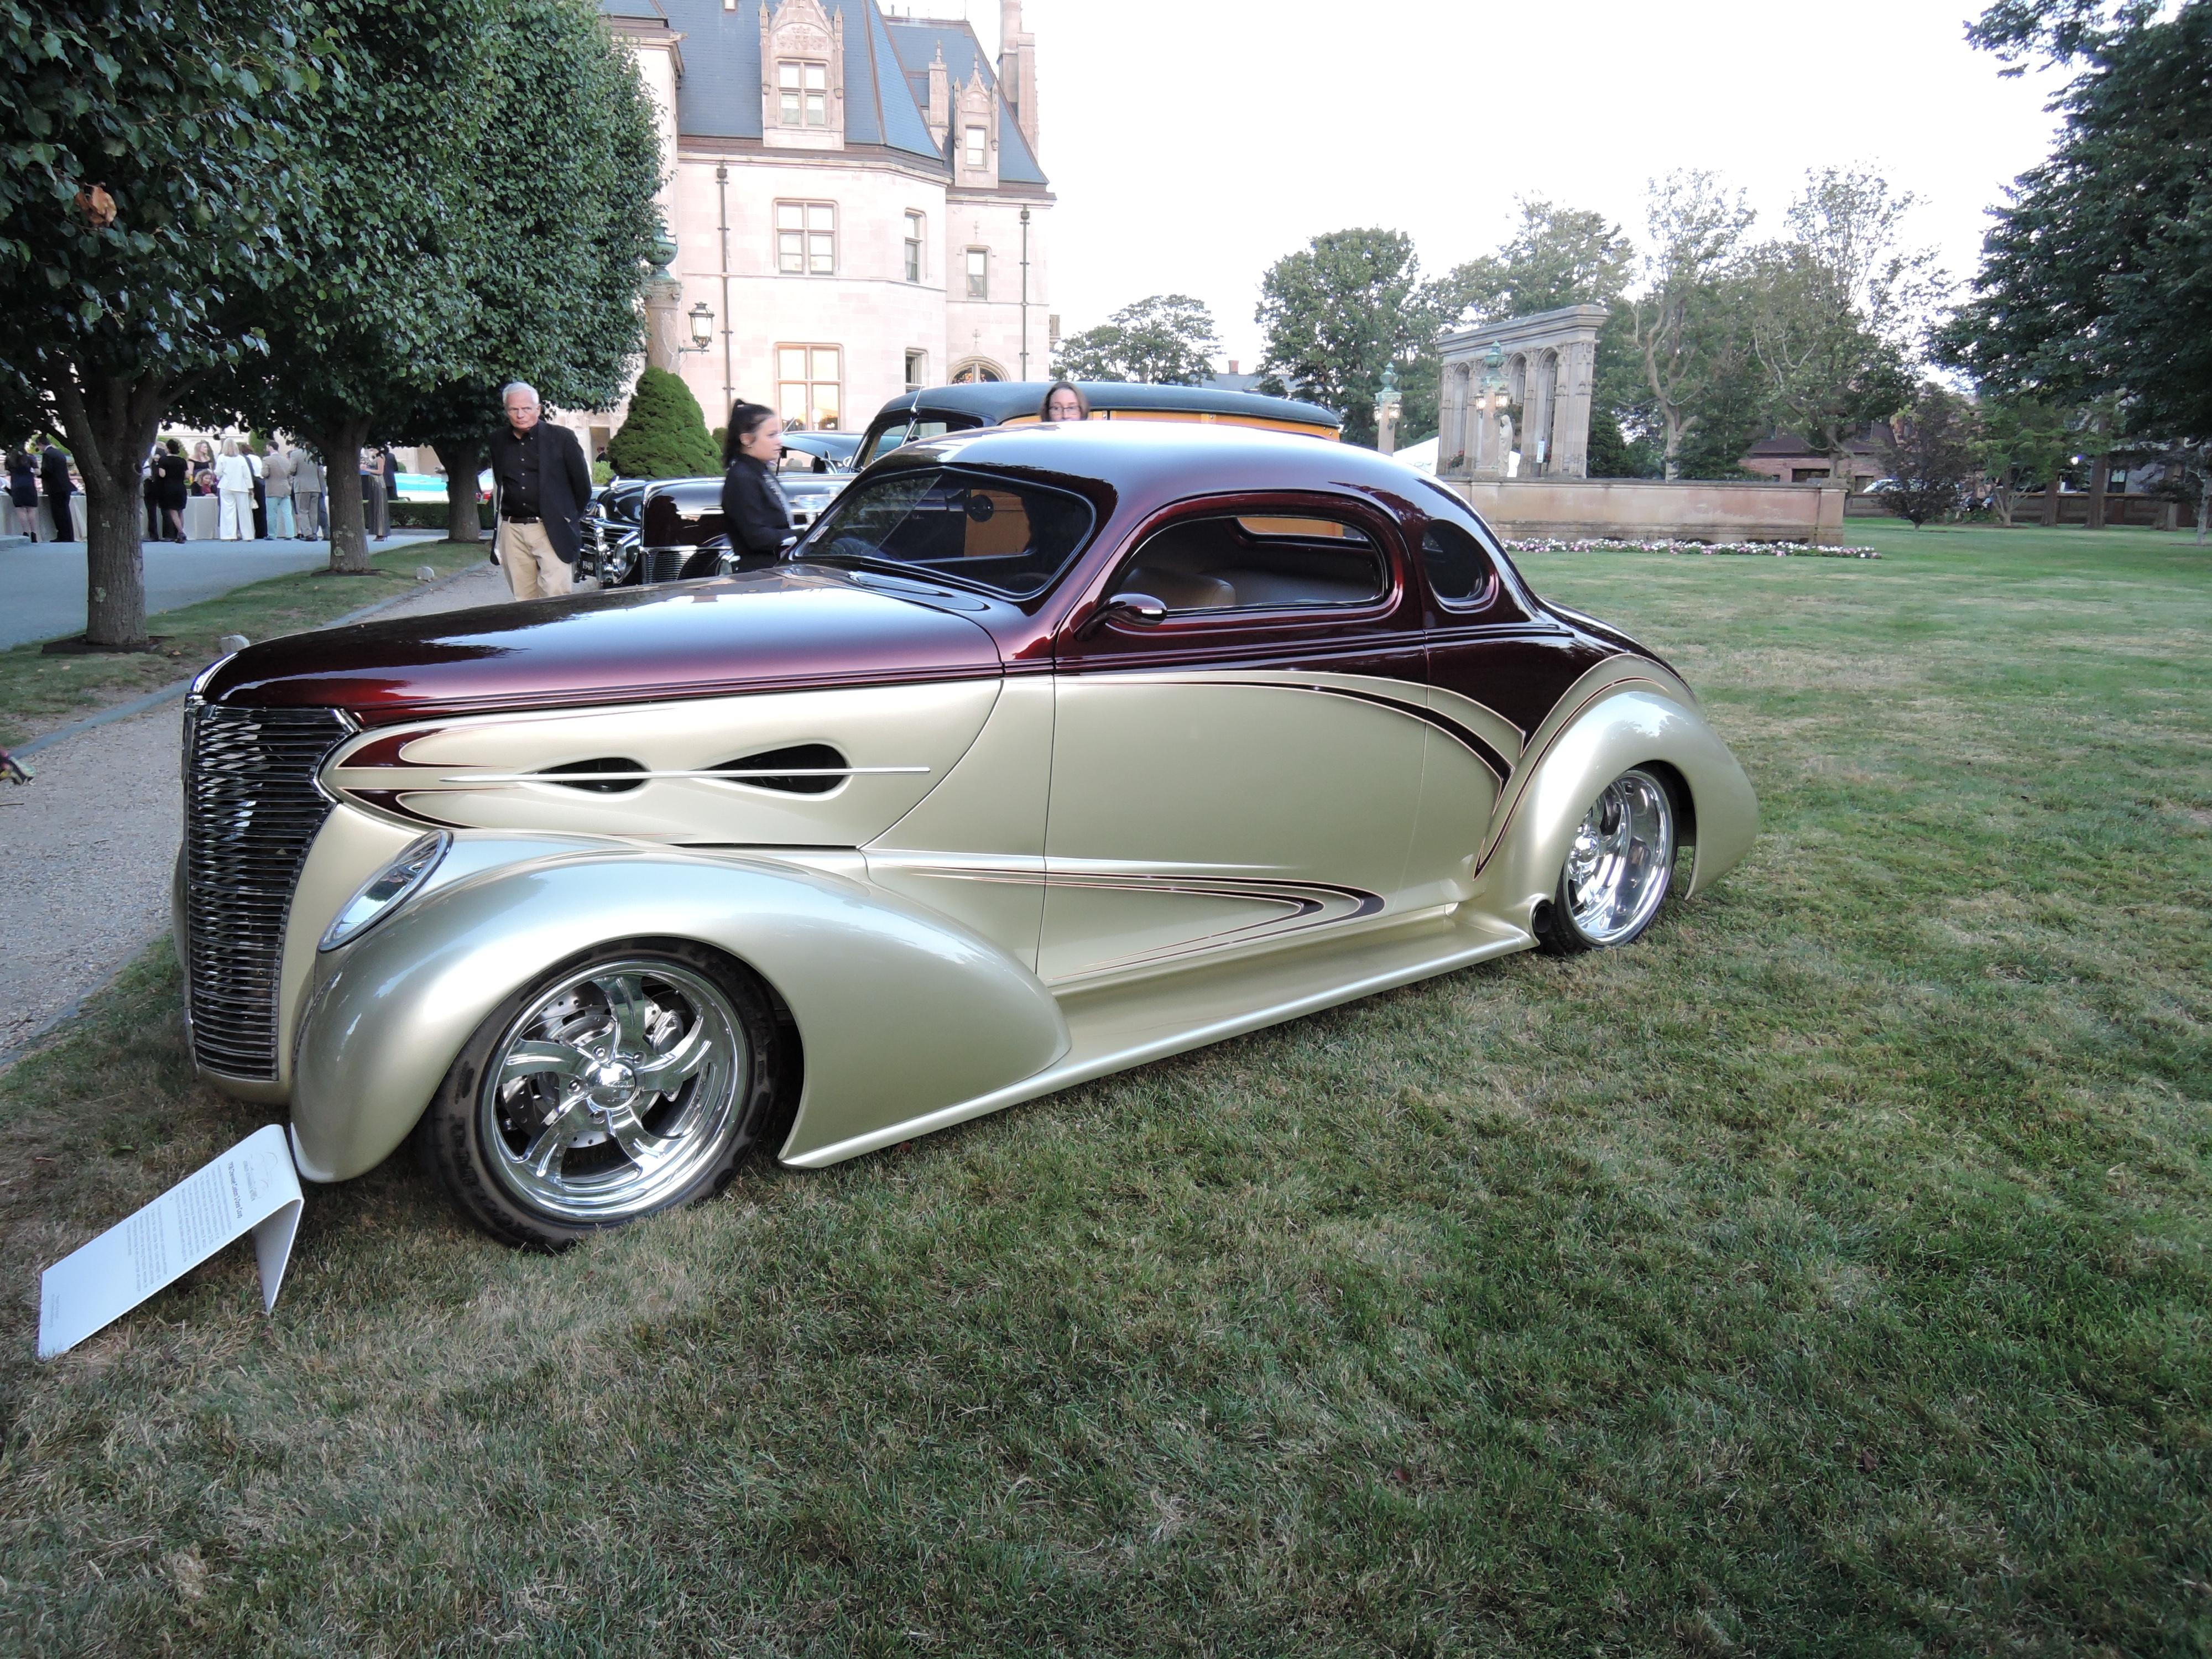 zenith gold/candy apple brandywine 1938 Chevrolet Custom 2-Door Coupe - Audrain Auto Museum Gala 2017